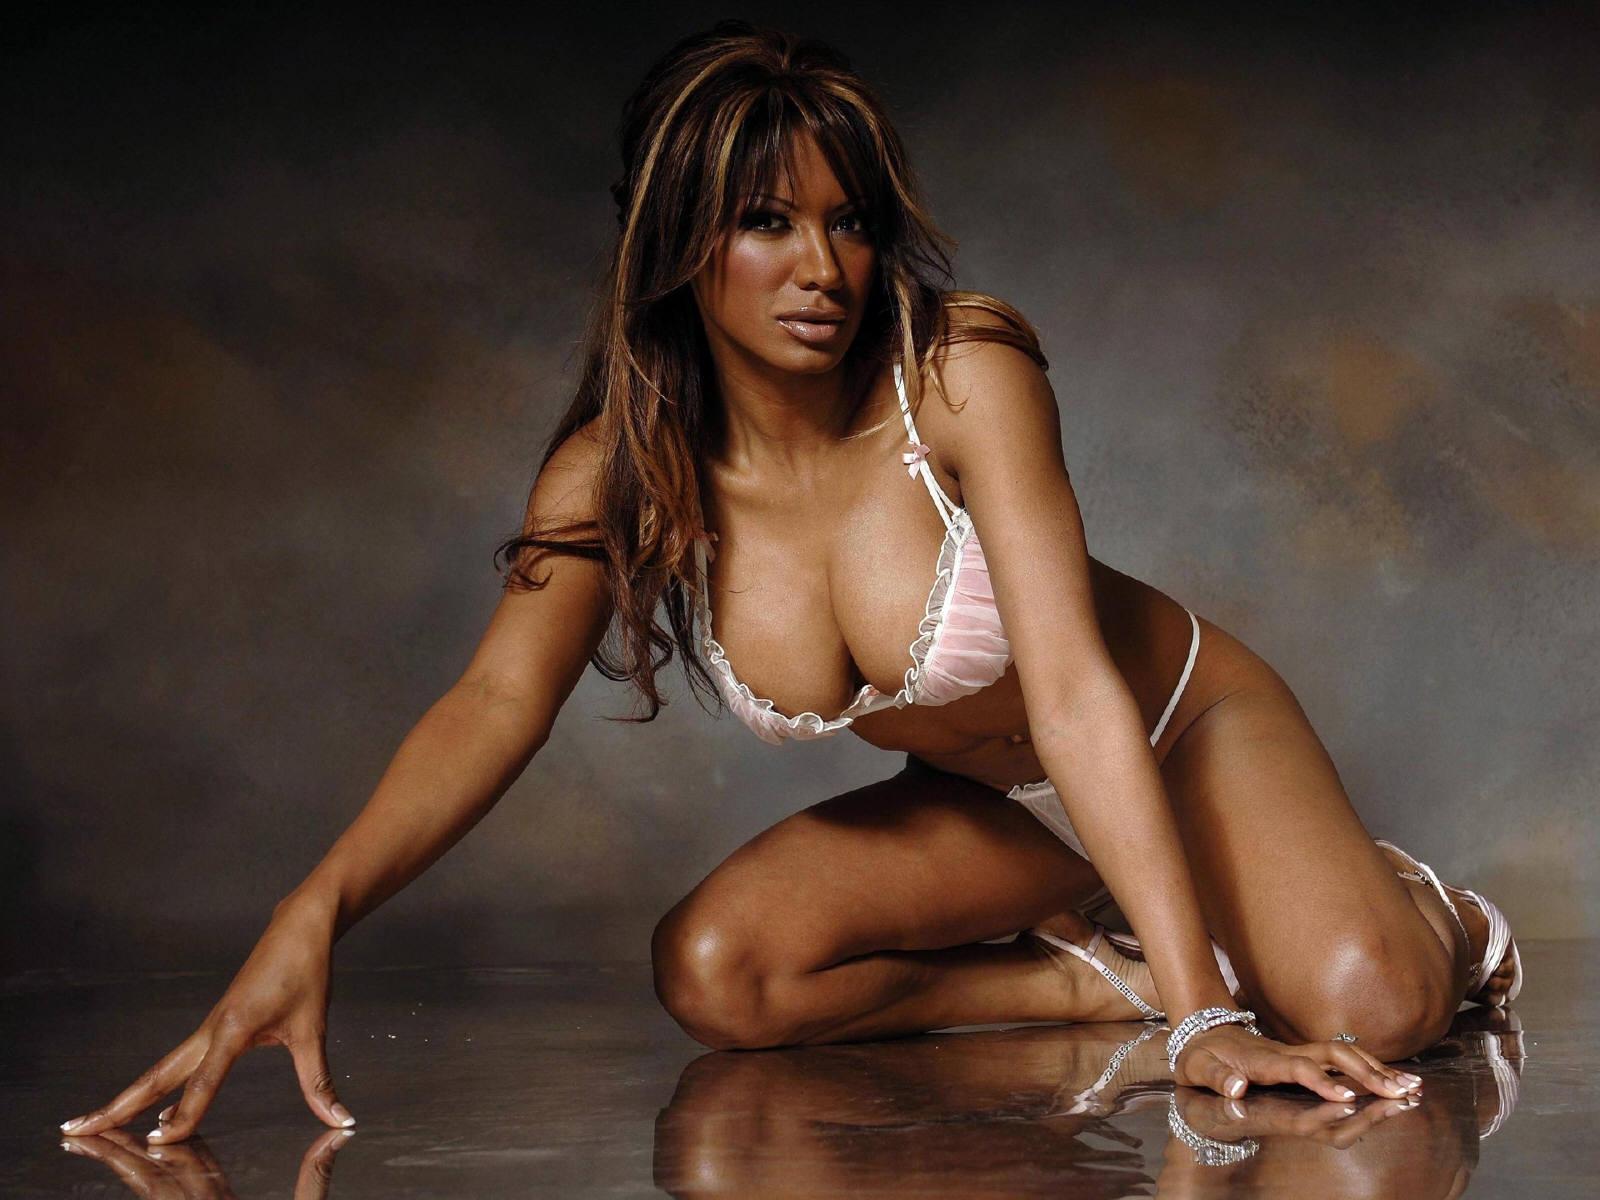 Boobs Emmanuelle Vera (b. 1994) nudes (89 fotos) Tits, Facebook, braless